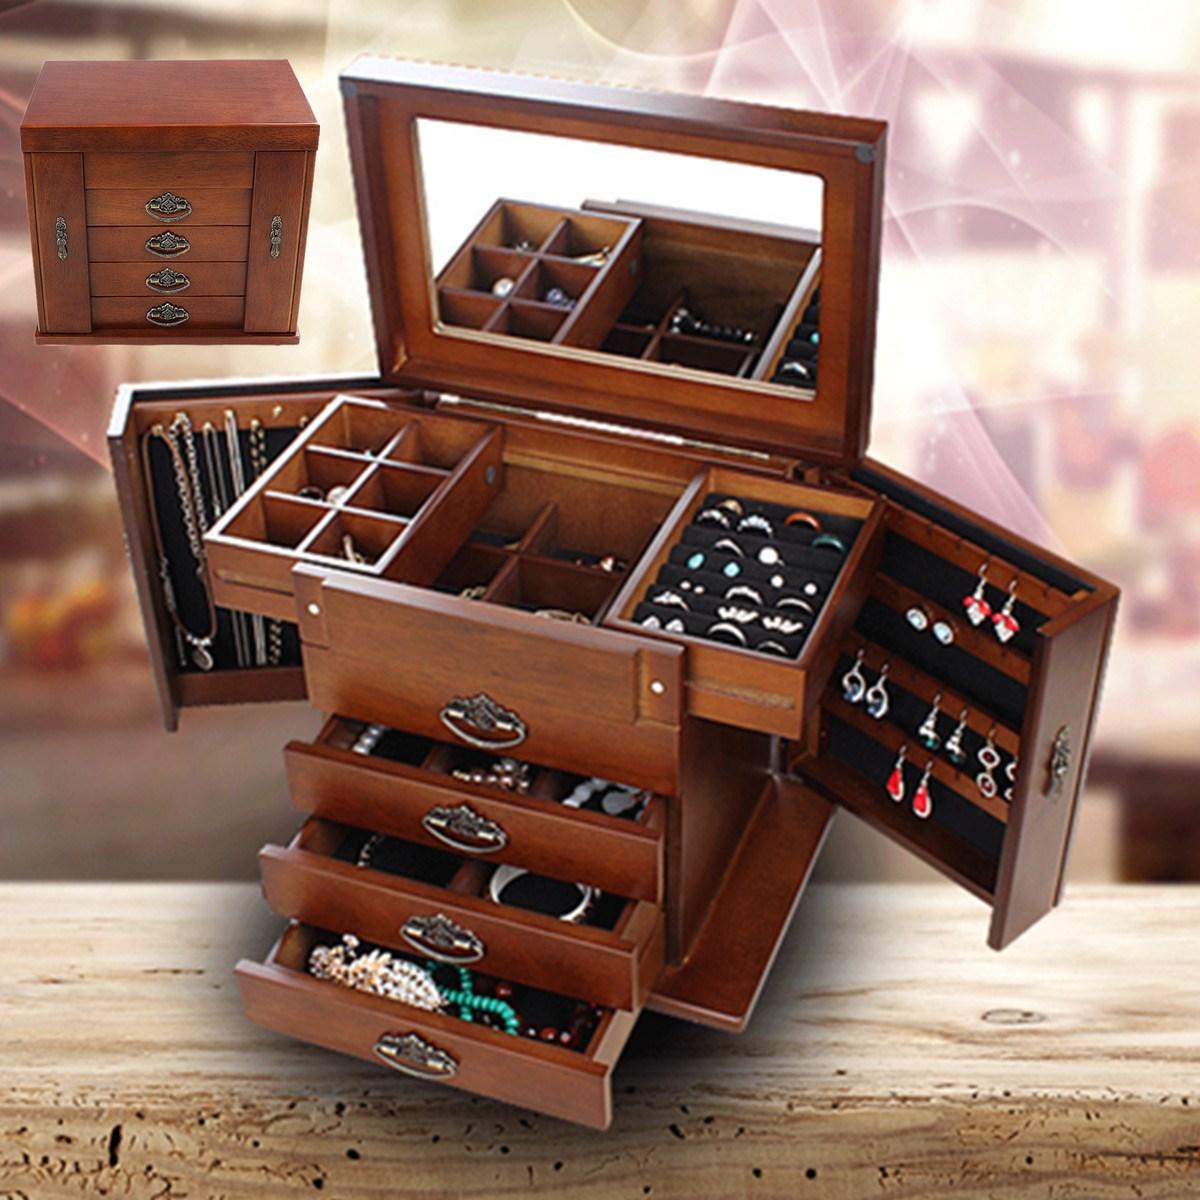 Large Multi-Layer Retro Wooden Jewelry Box Luxury Jewelry Display Tray Holder Casket Earrings Ring Box Mirror Jewelry Organizers